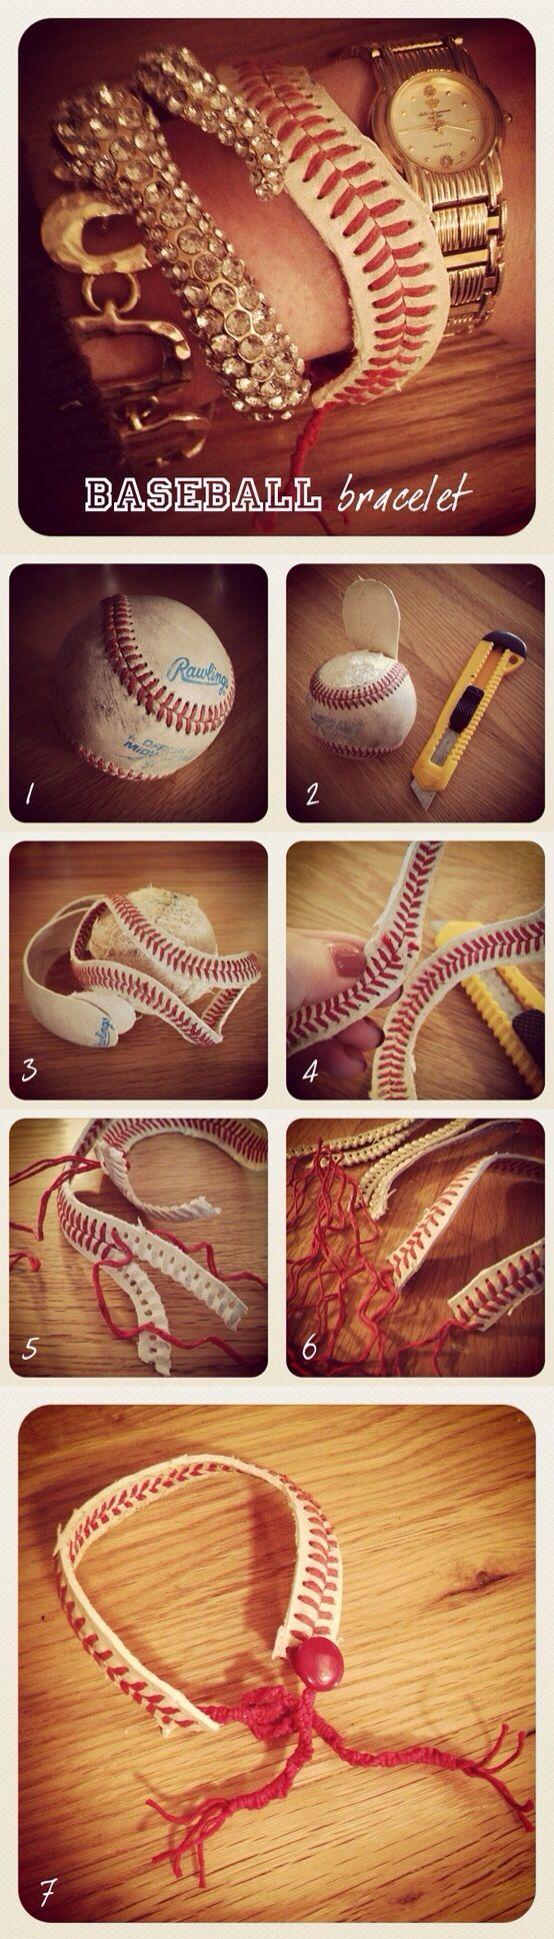 Baseball bracelets are the best. ⚾️❤️